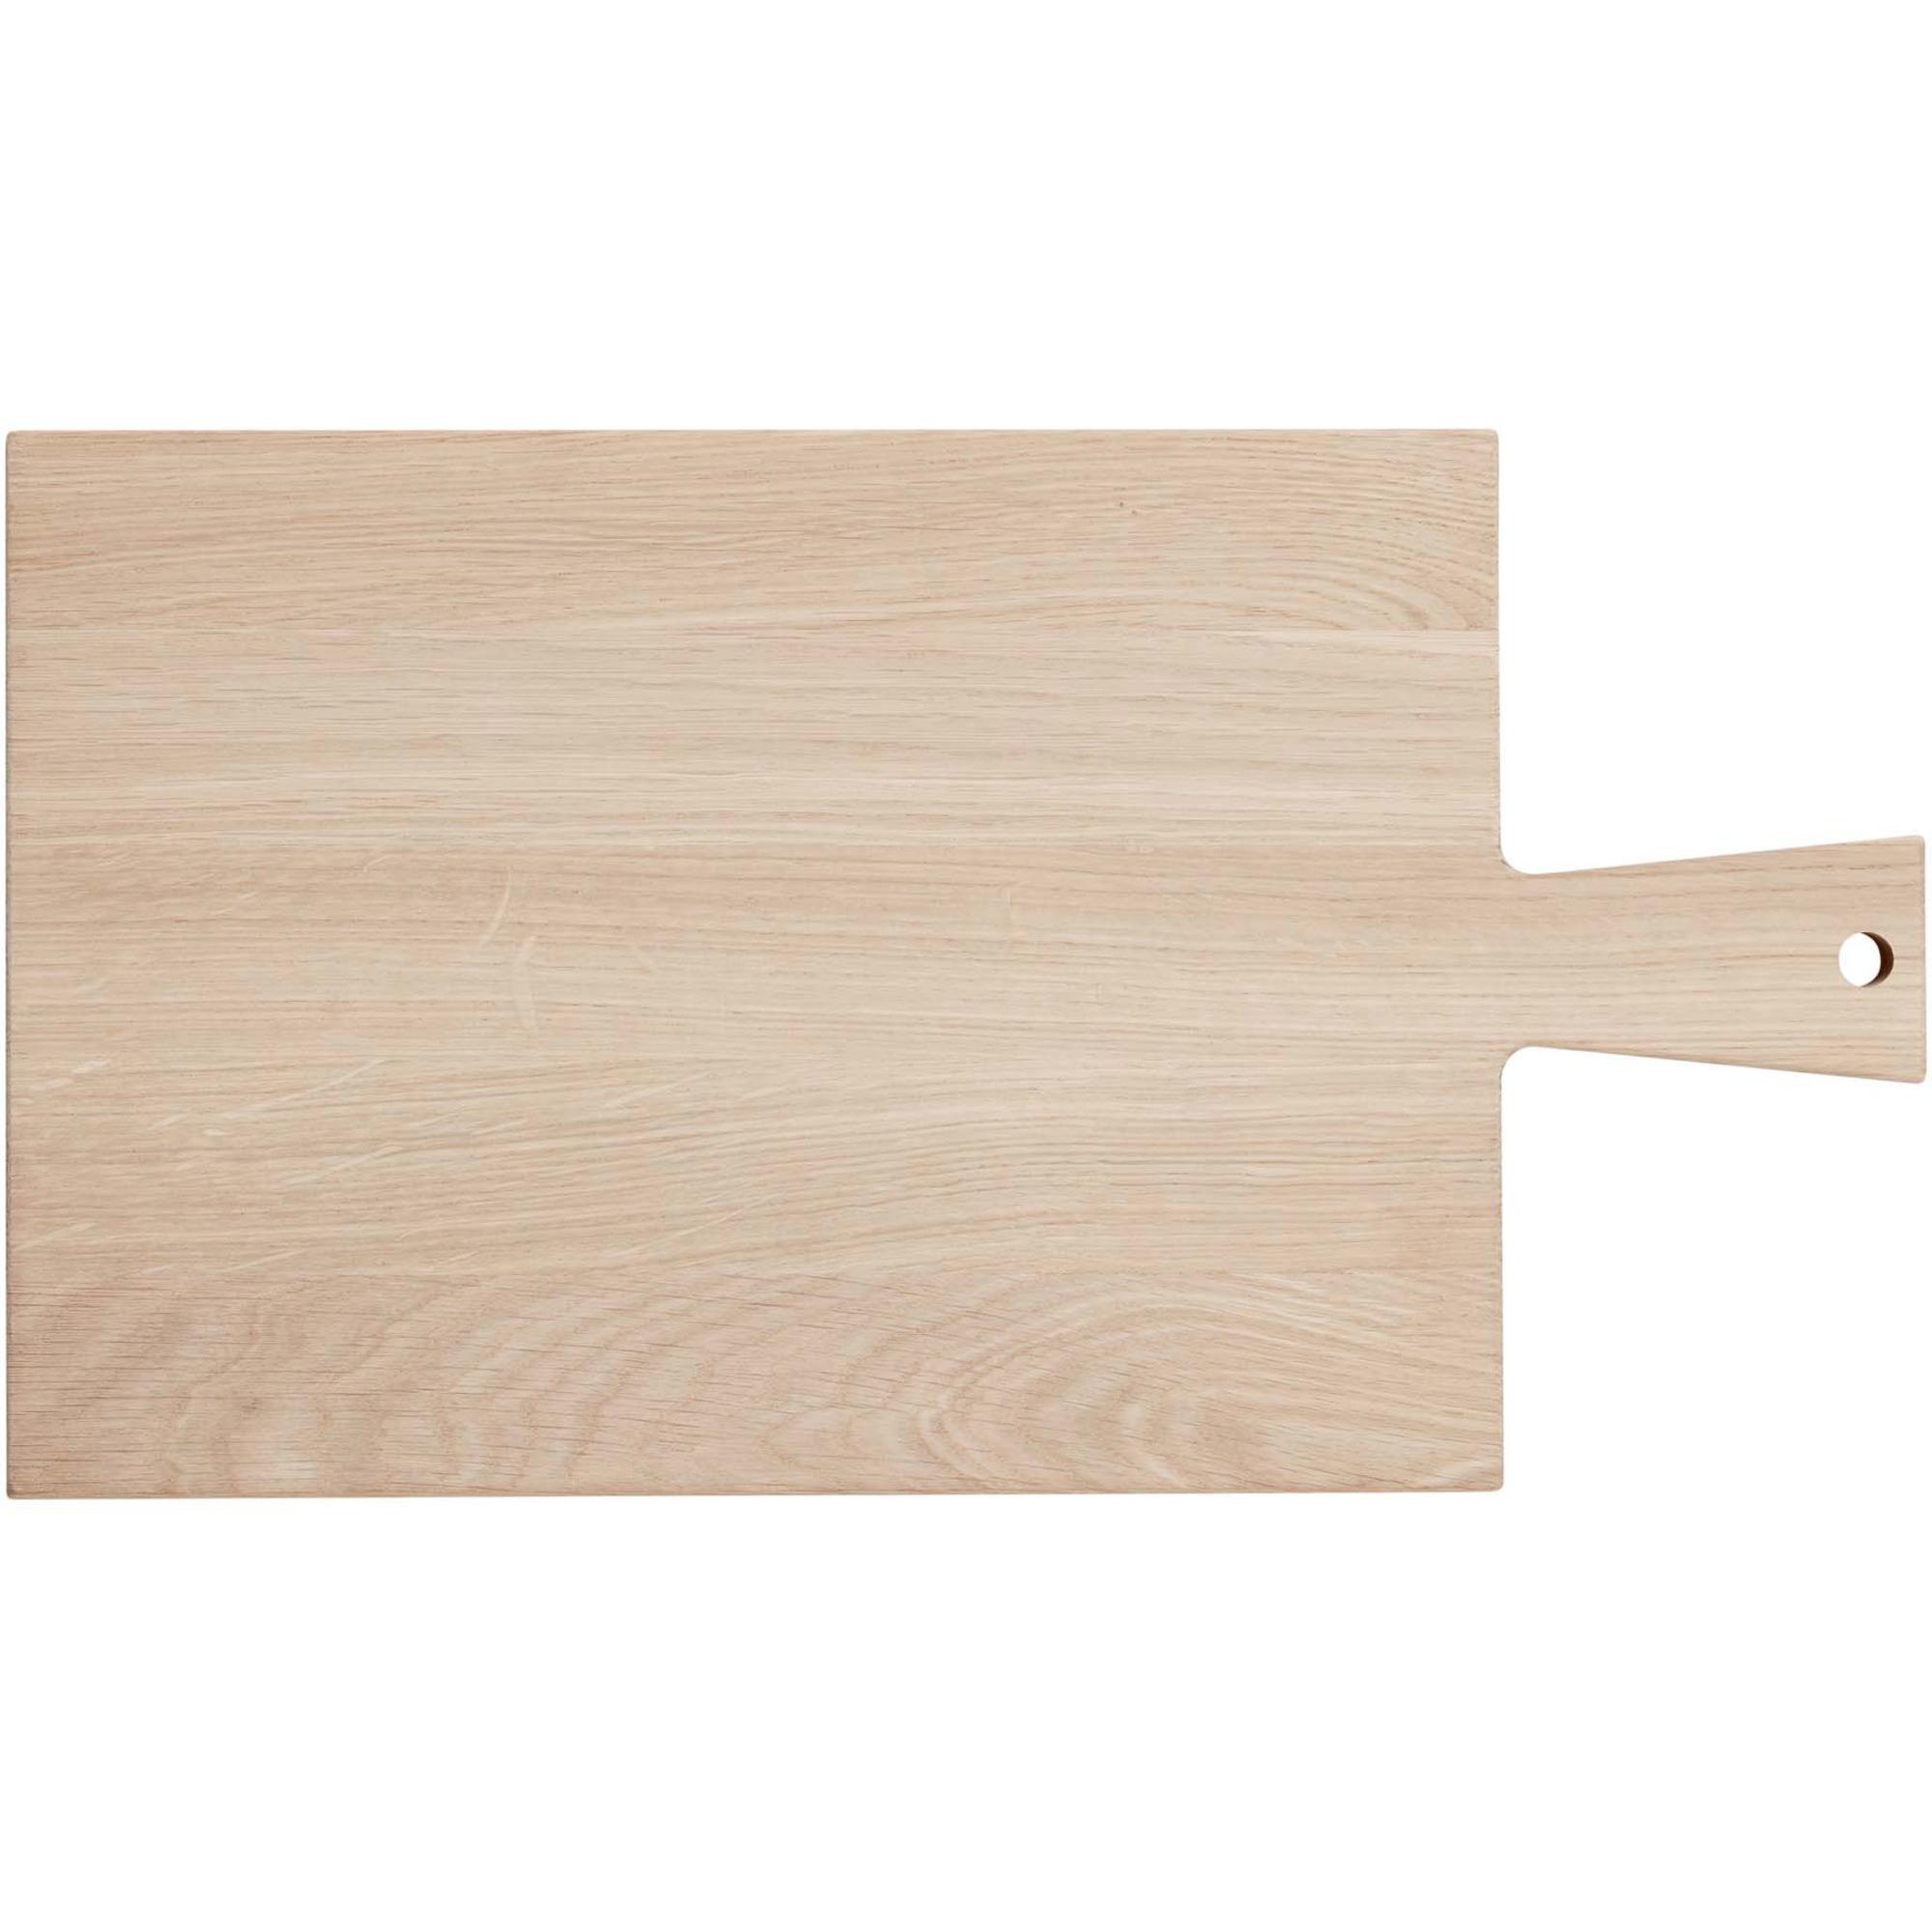 Andersen Furniture Serveringsbricka 45 x 25 cm Oak